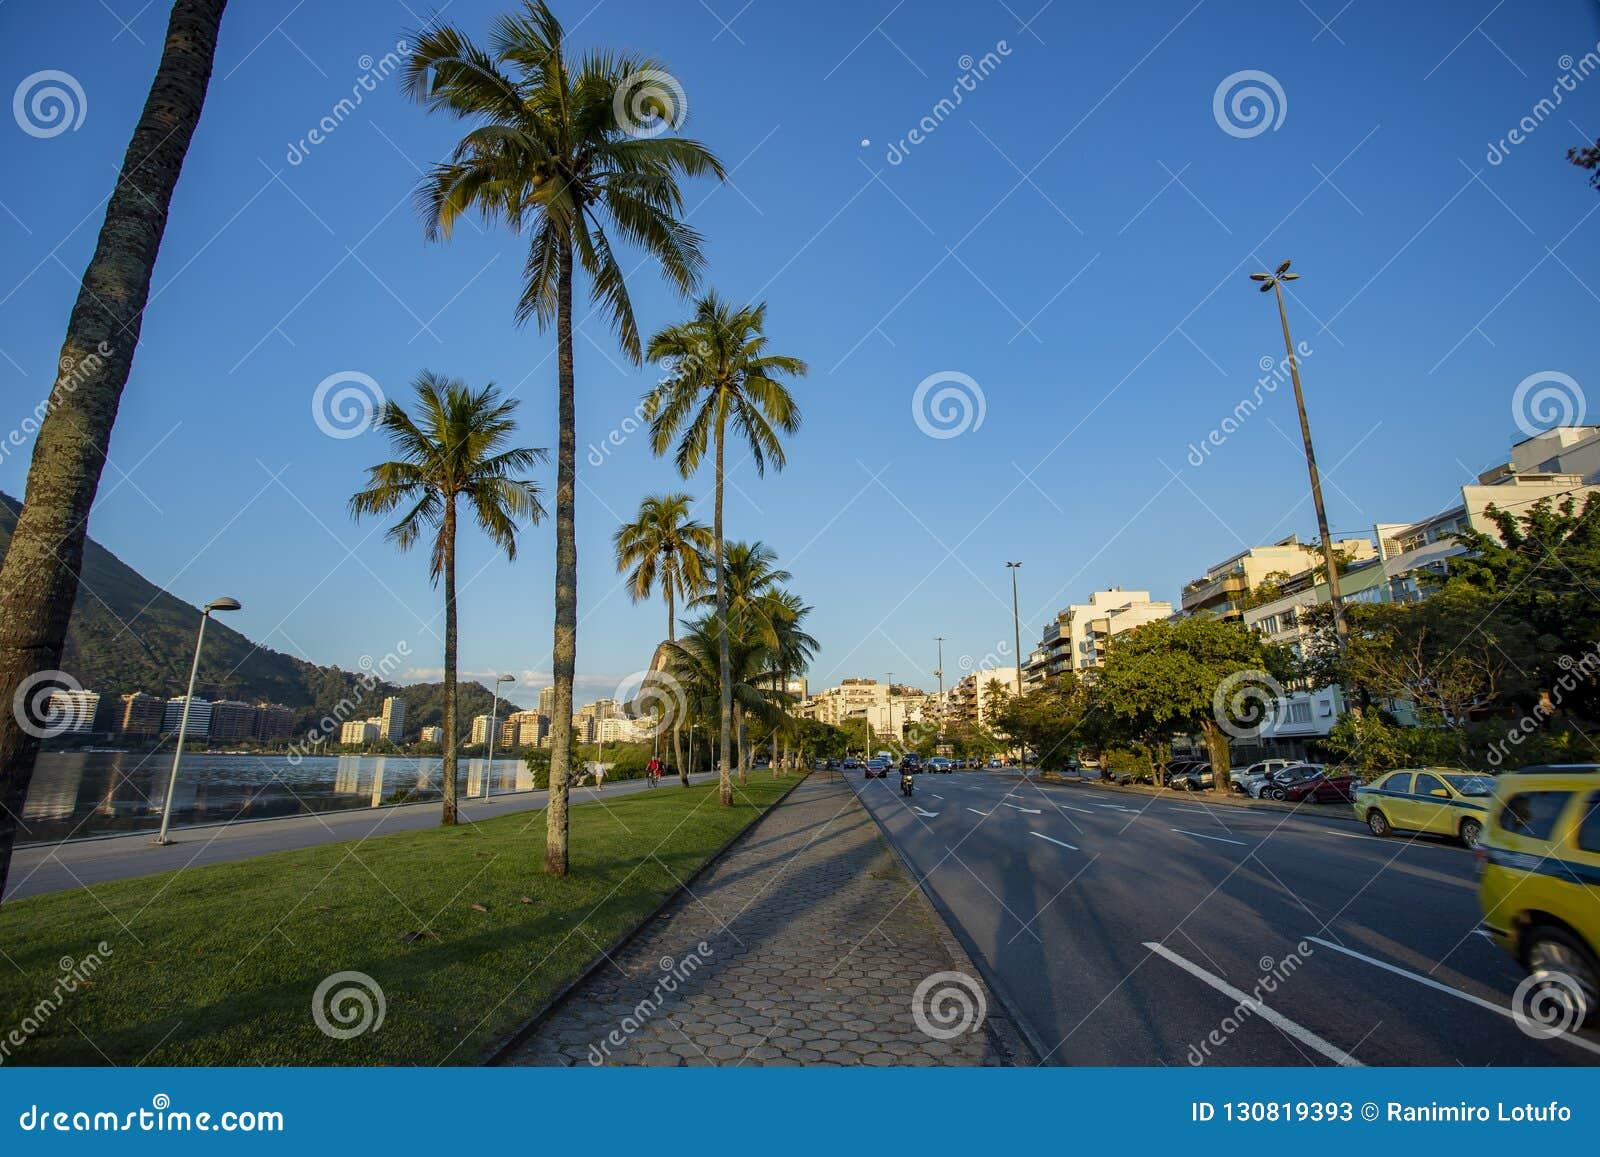 Ciudad de la laguna de Rio de Janeiro, del Brasil, de la avenida de Epitacio Pessoa y de Rodrigo de Freitas